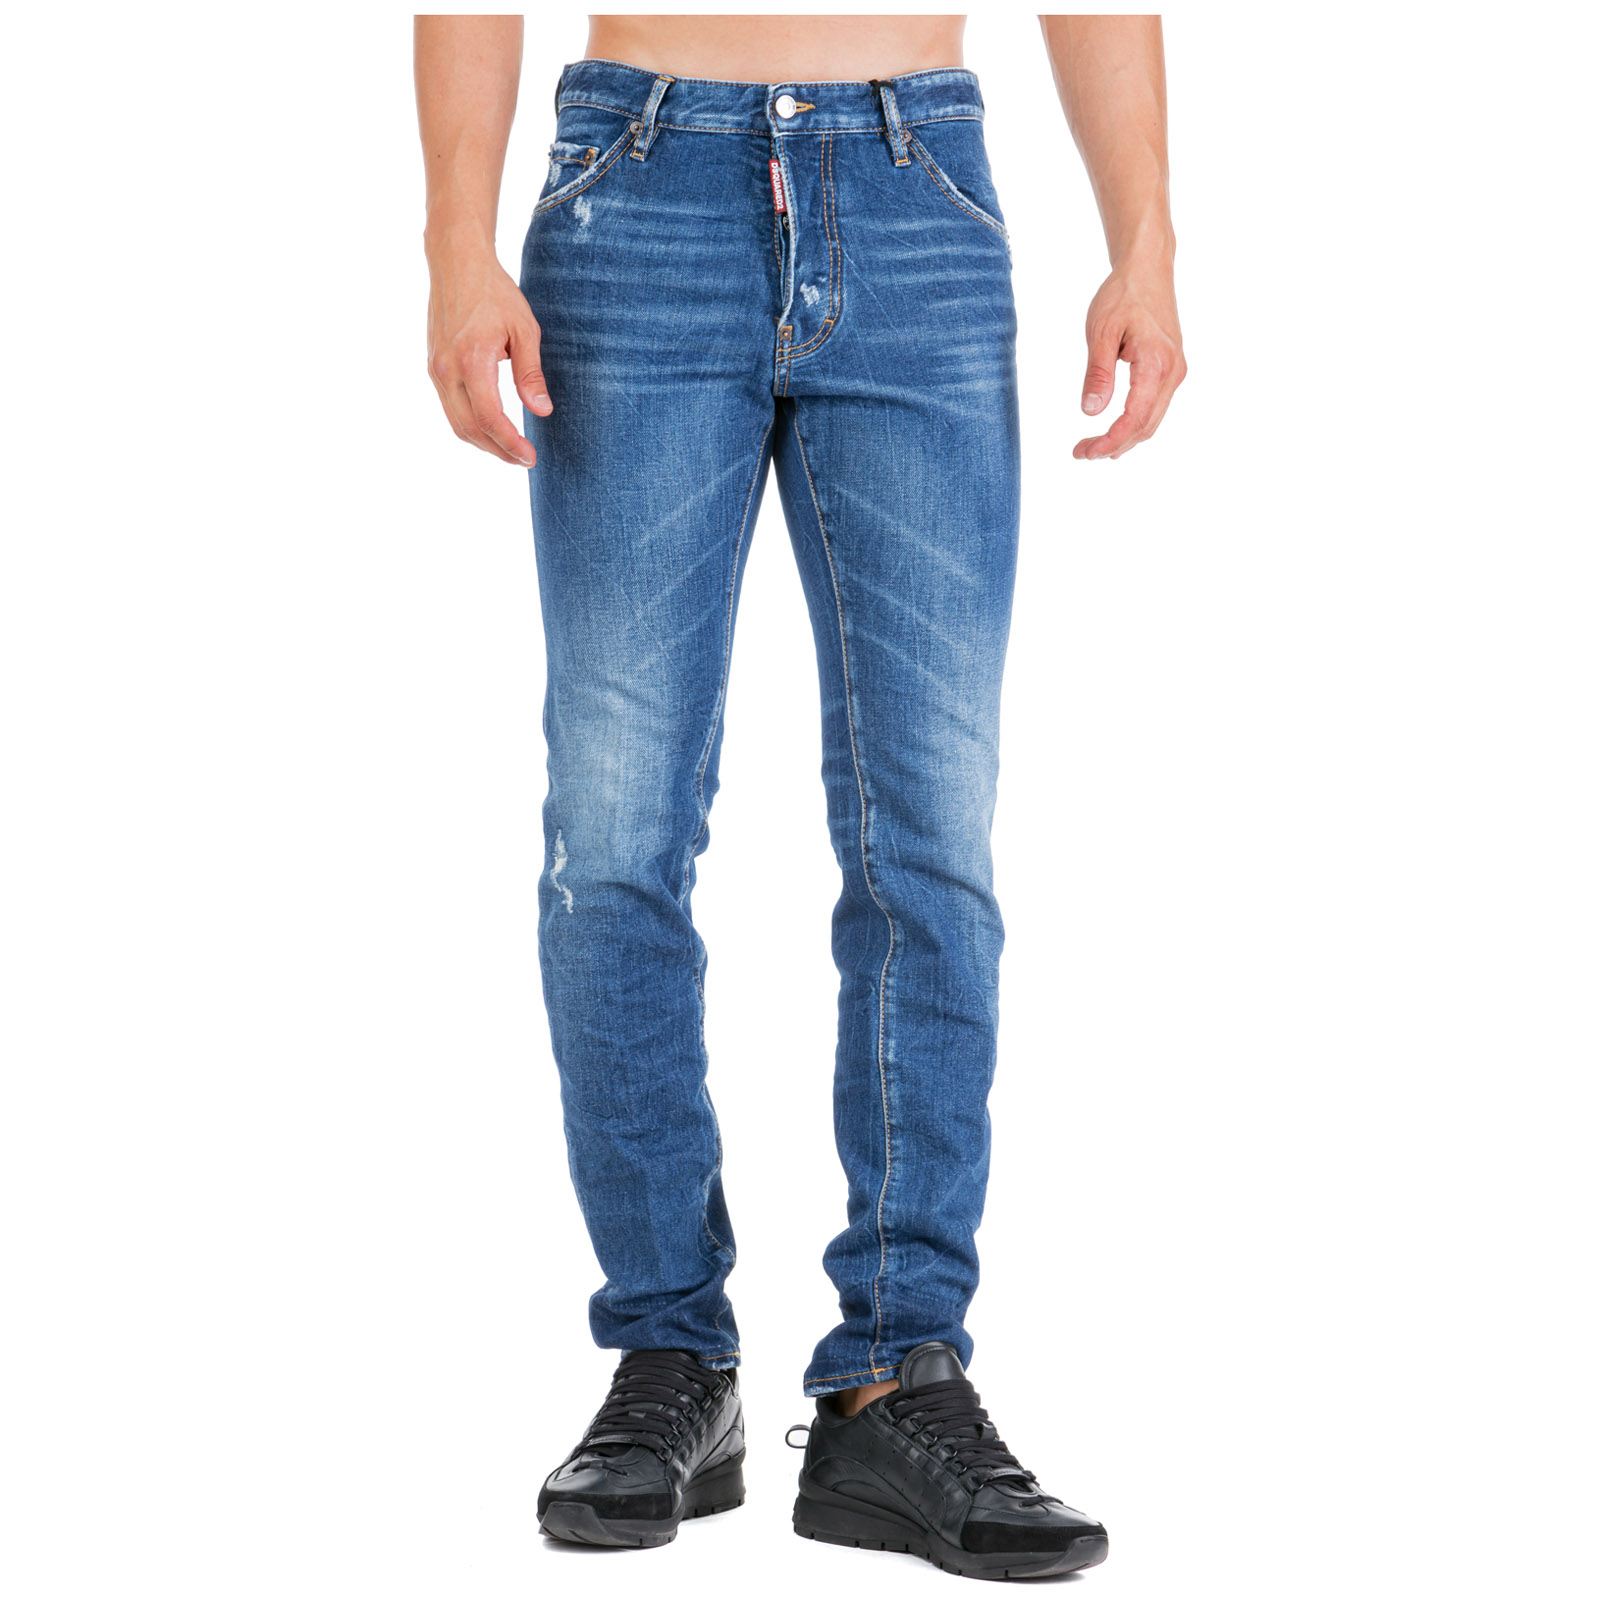 Men's jeans denim cool guy